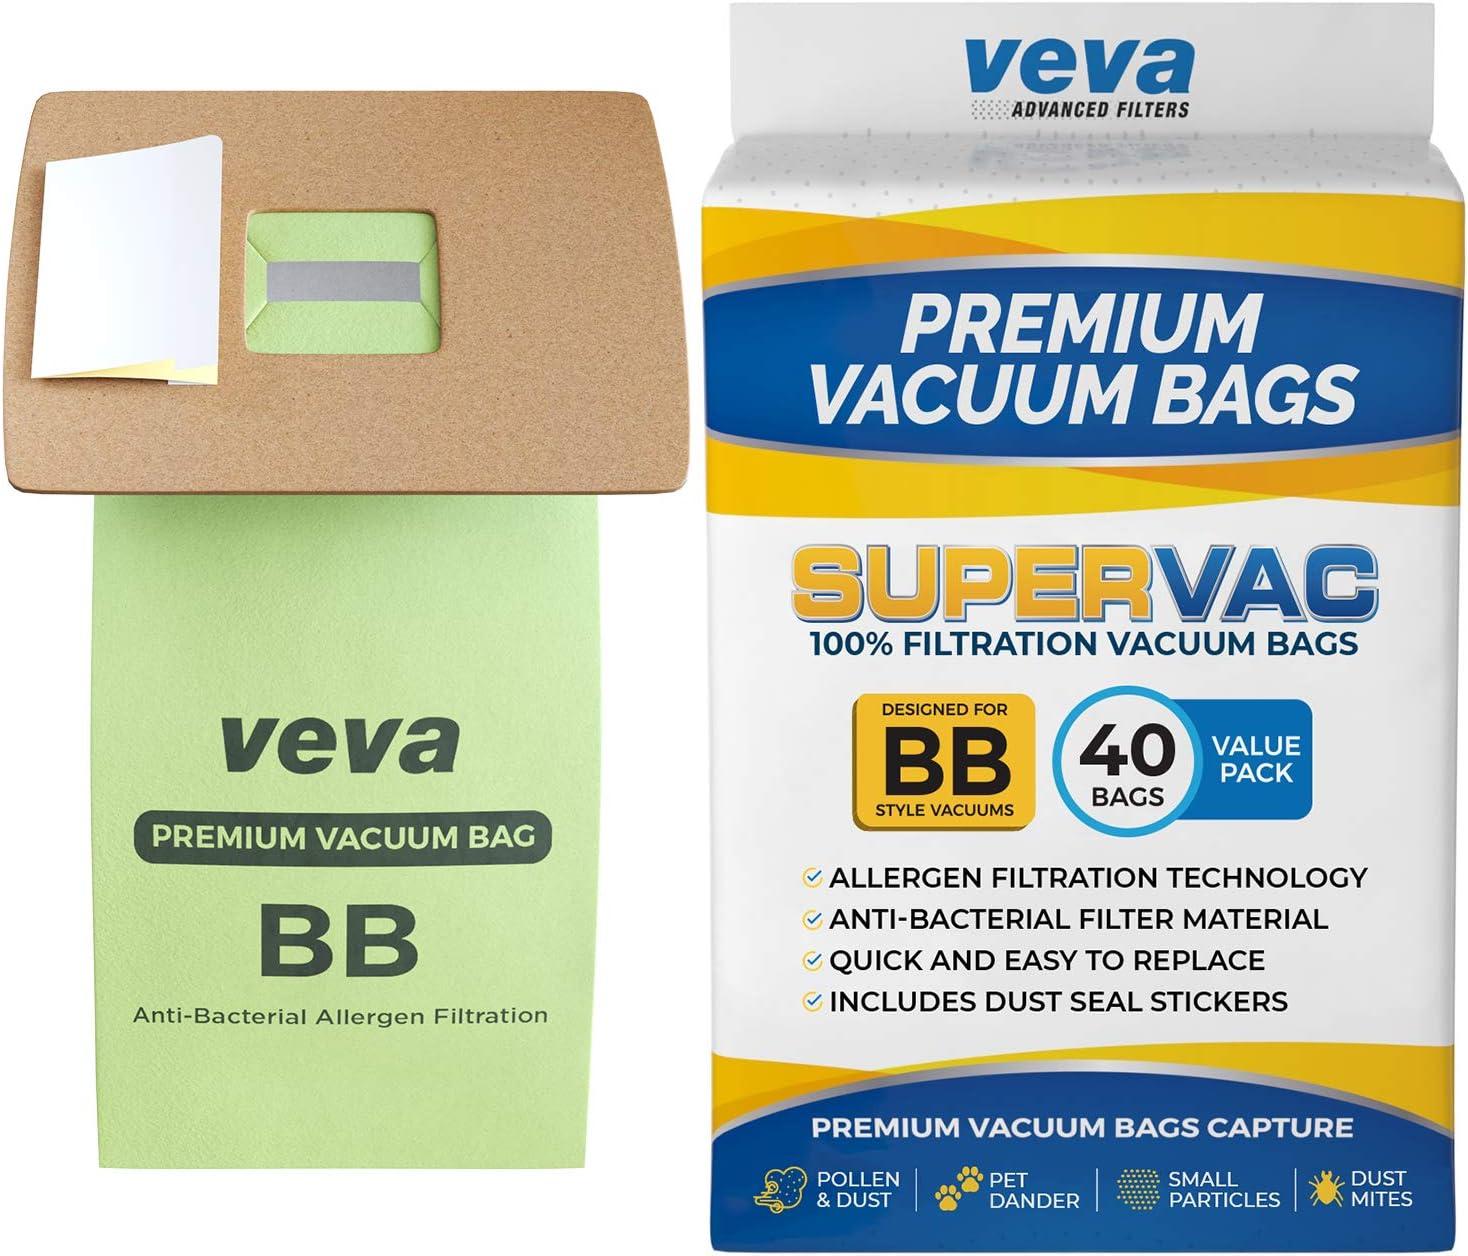 VEVA 40 Pack Premium SuperVac Vacuum Bags Style BB Work with All Handheld Vacuum Models BB180, BB280, BB850, BB870, BB880, BB900, BB1000, BB1100, BB1200